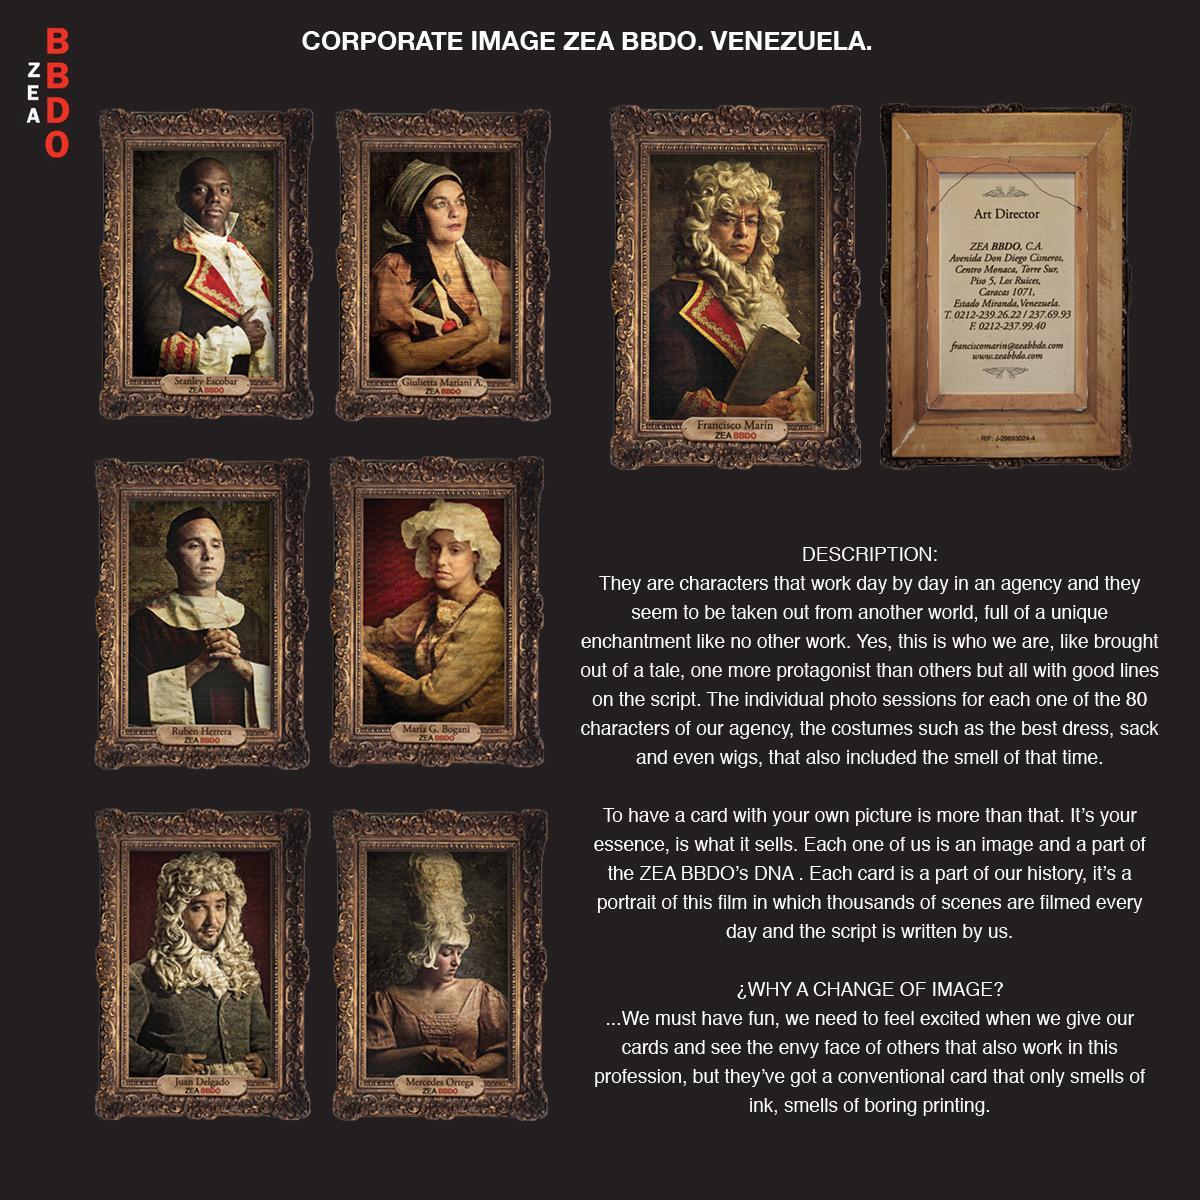 ZEA BBDO Direct Ad -  Corporate Image